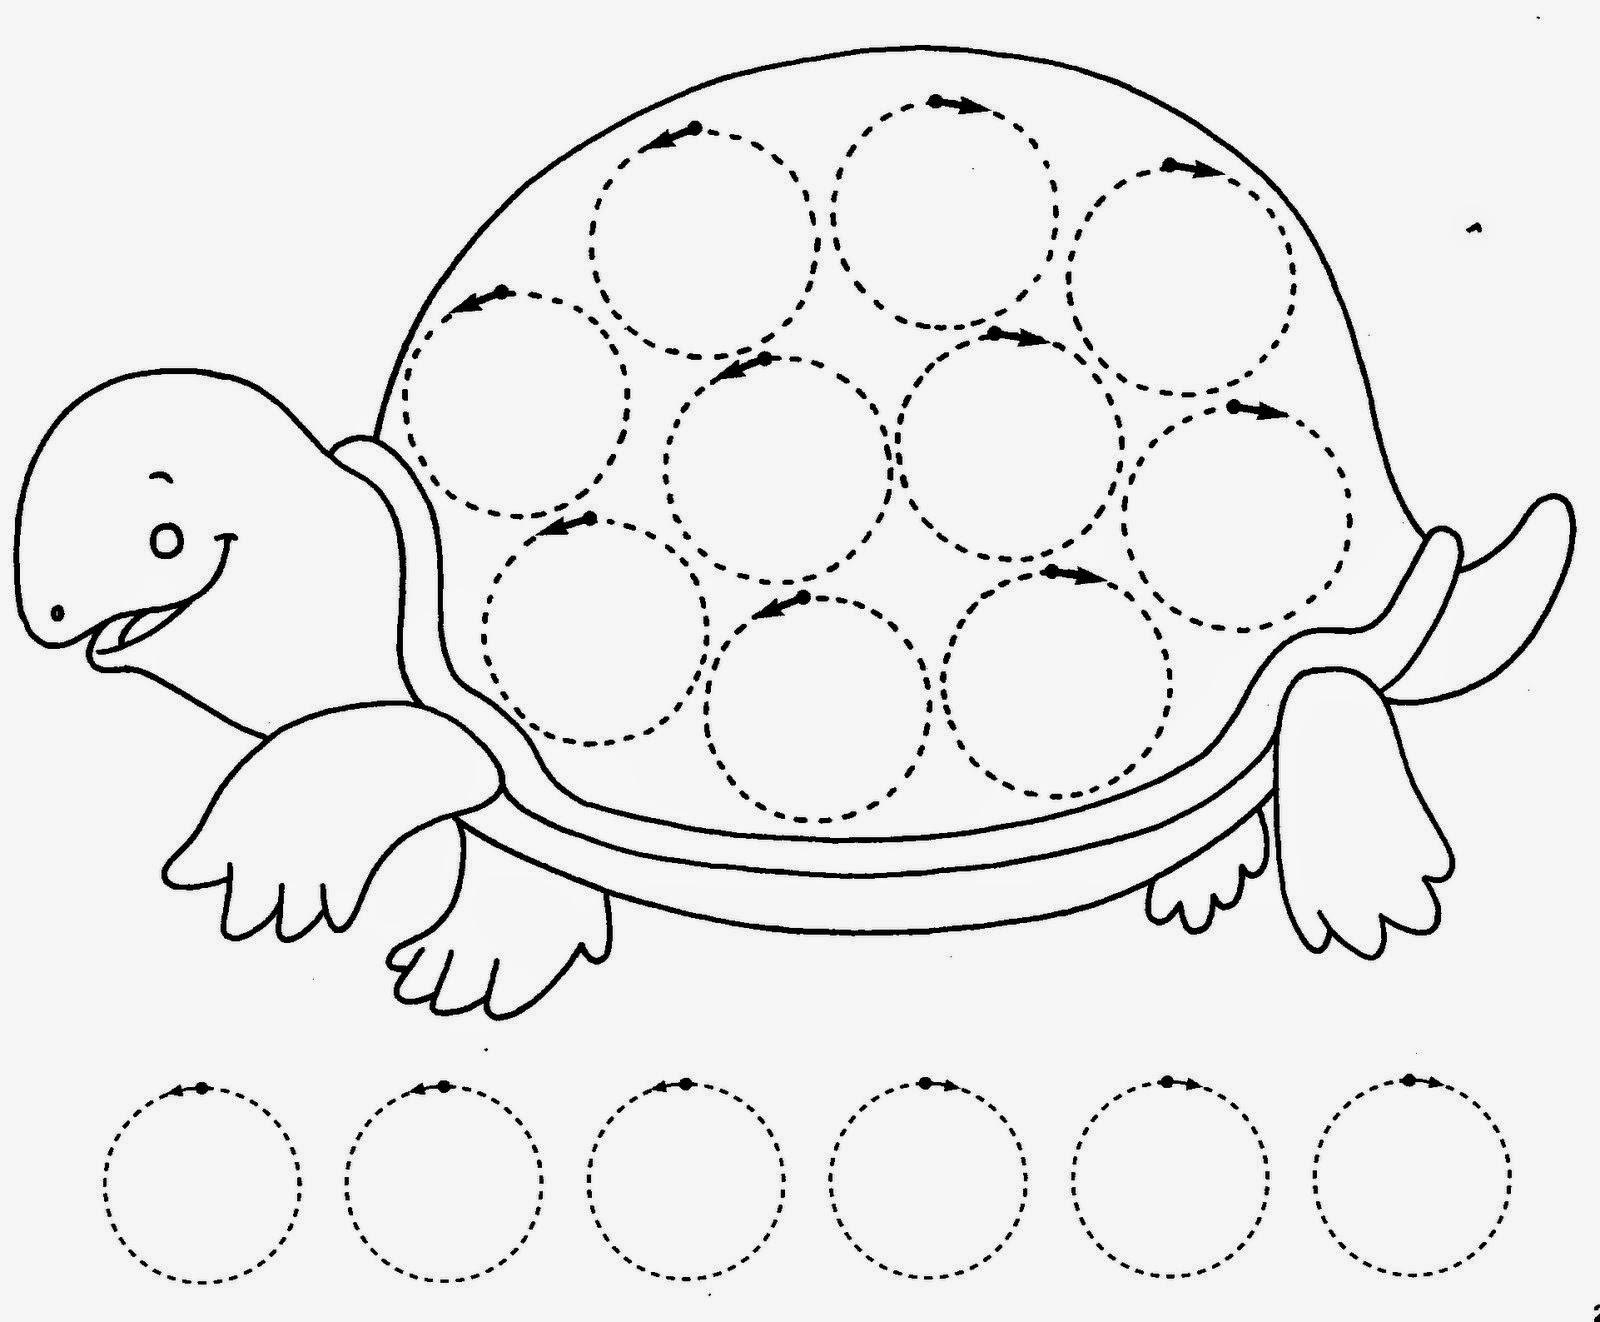 Colorear Dibujos Ninos 3 Anos: Aurelia Aprende A Ser Mamá: Fichas Grafomotricidad Para